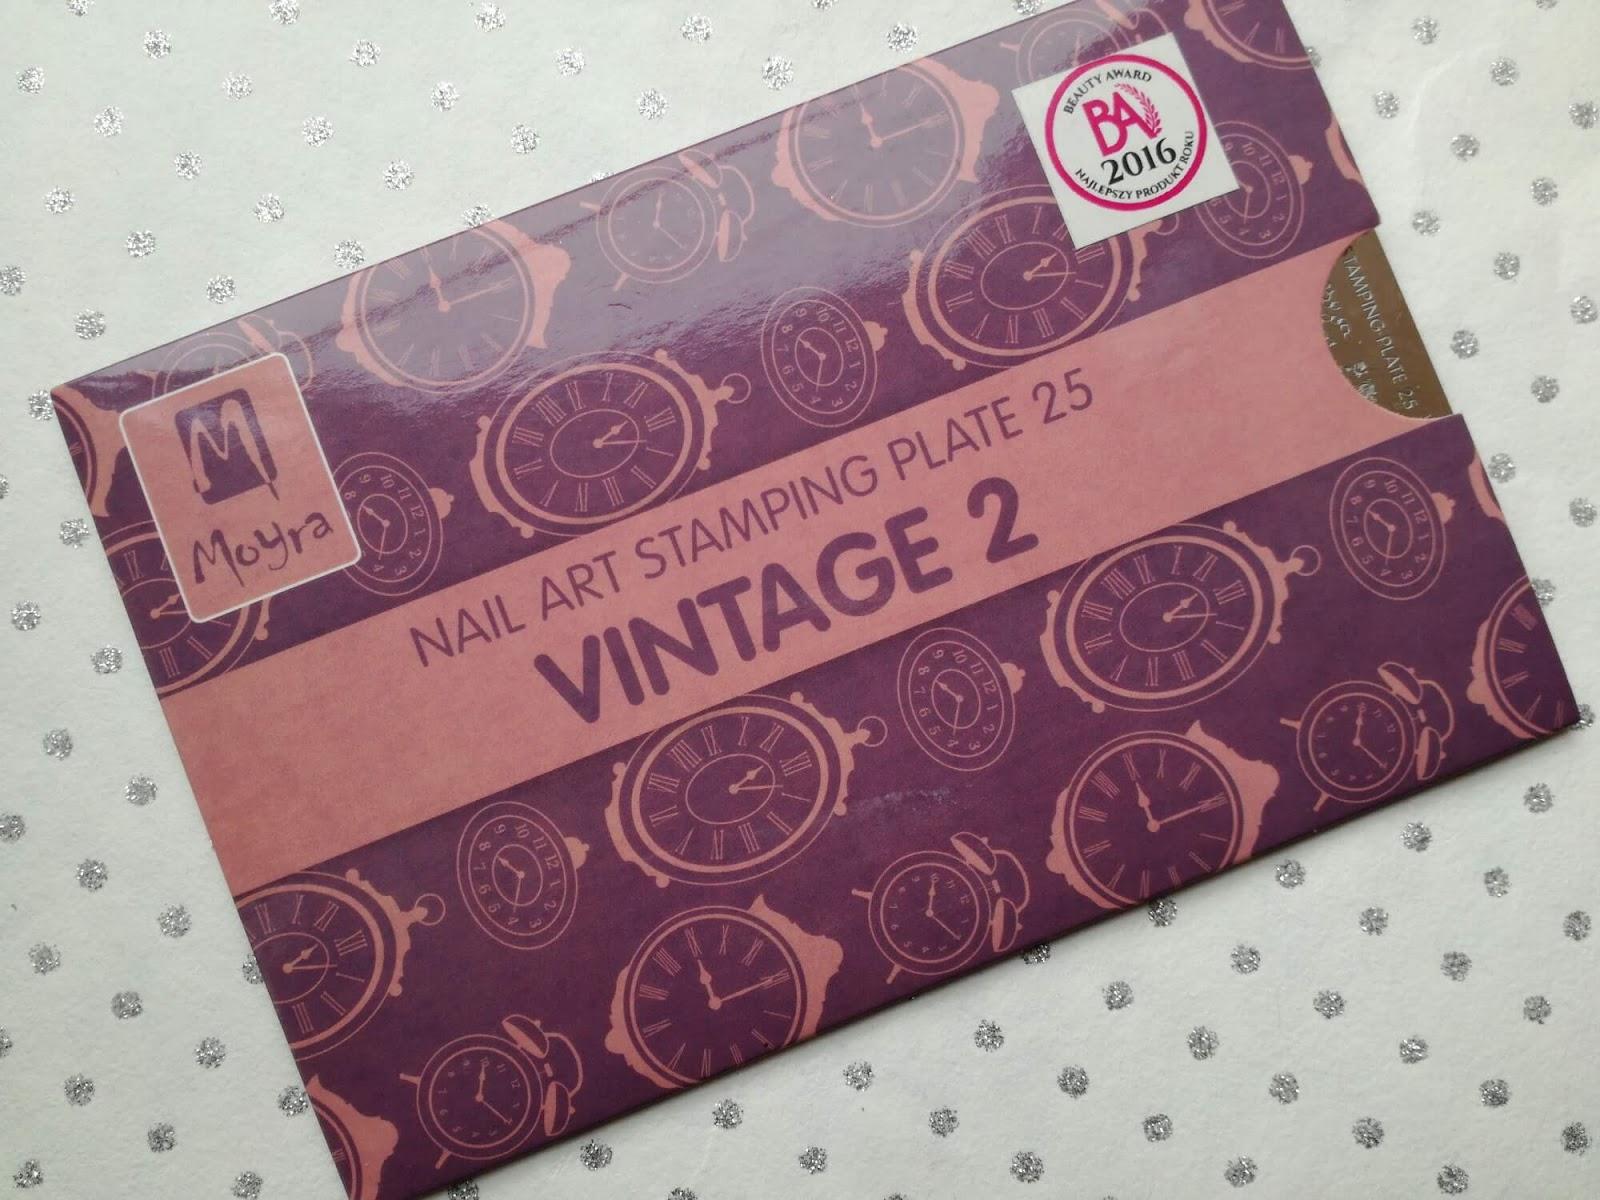 Moyra Nail Art Stamping Plate 25 Vintage 2